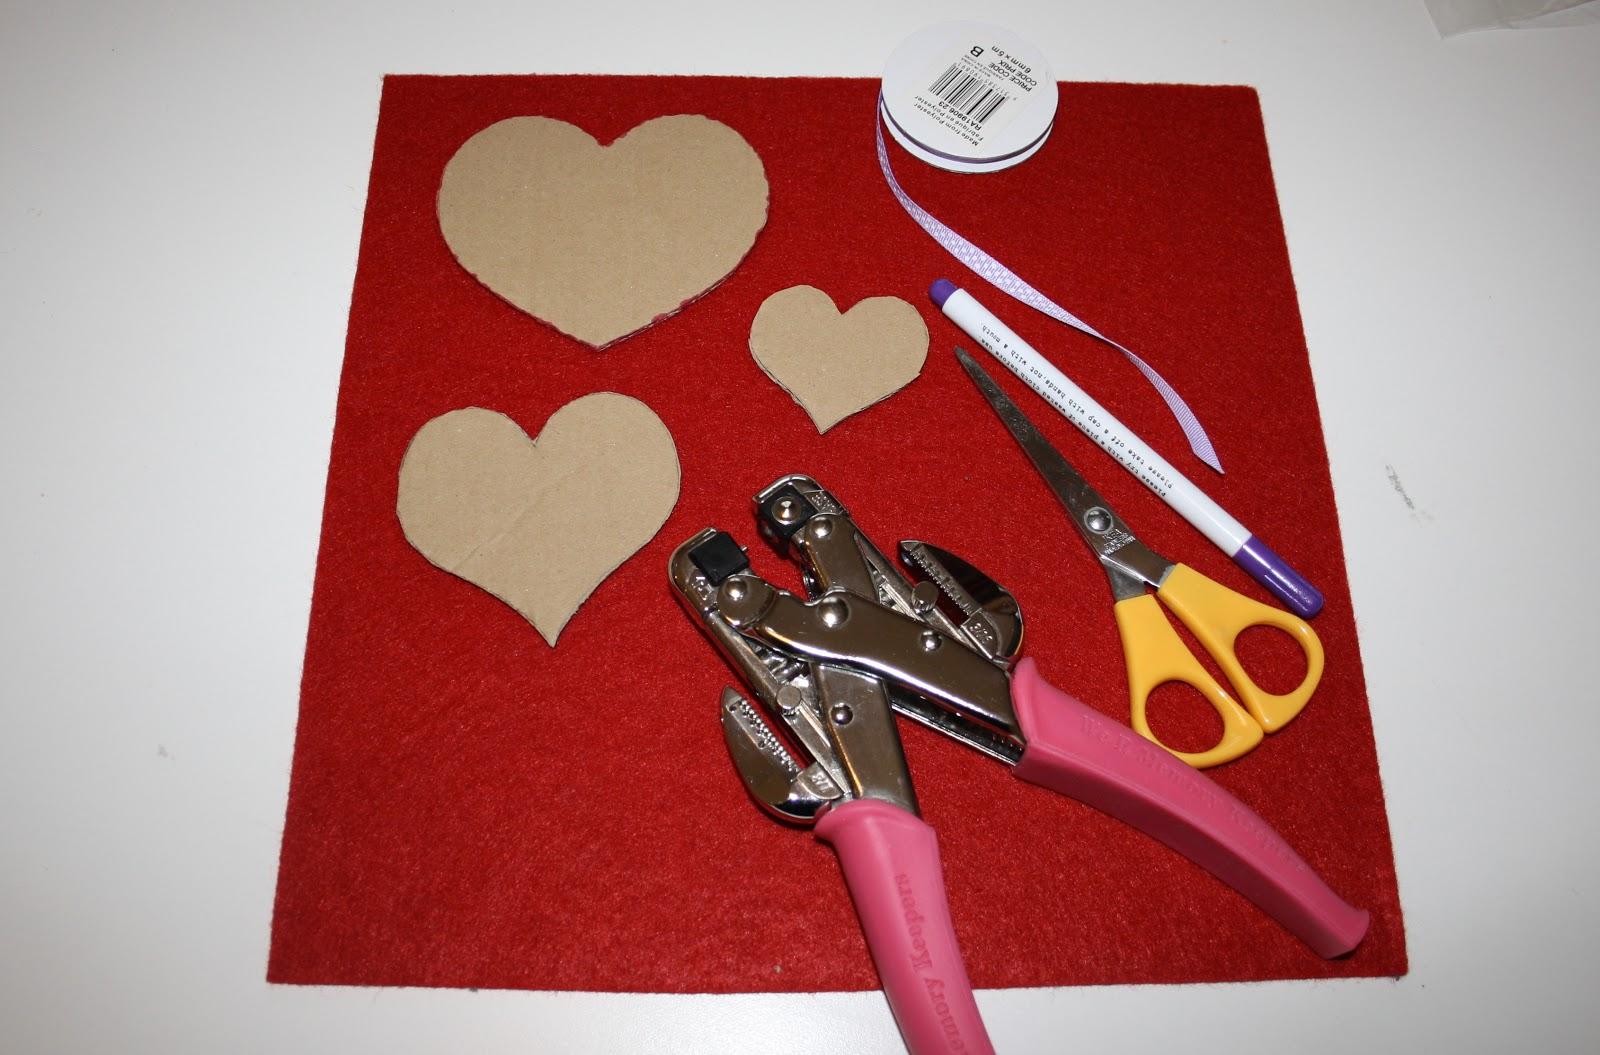 #BA8411 Orelane: DIY Déco De Noël En Feutrine 5843 tuto deco de noel fait main 1600x1055 px @ aertt.com